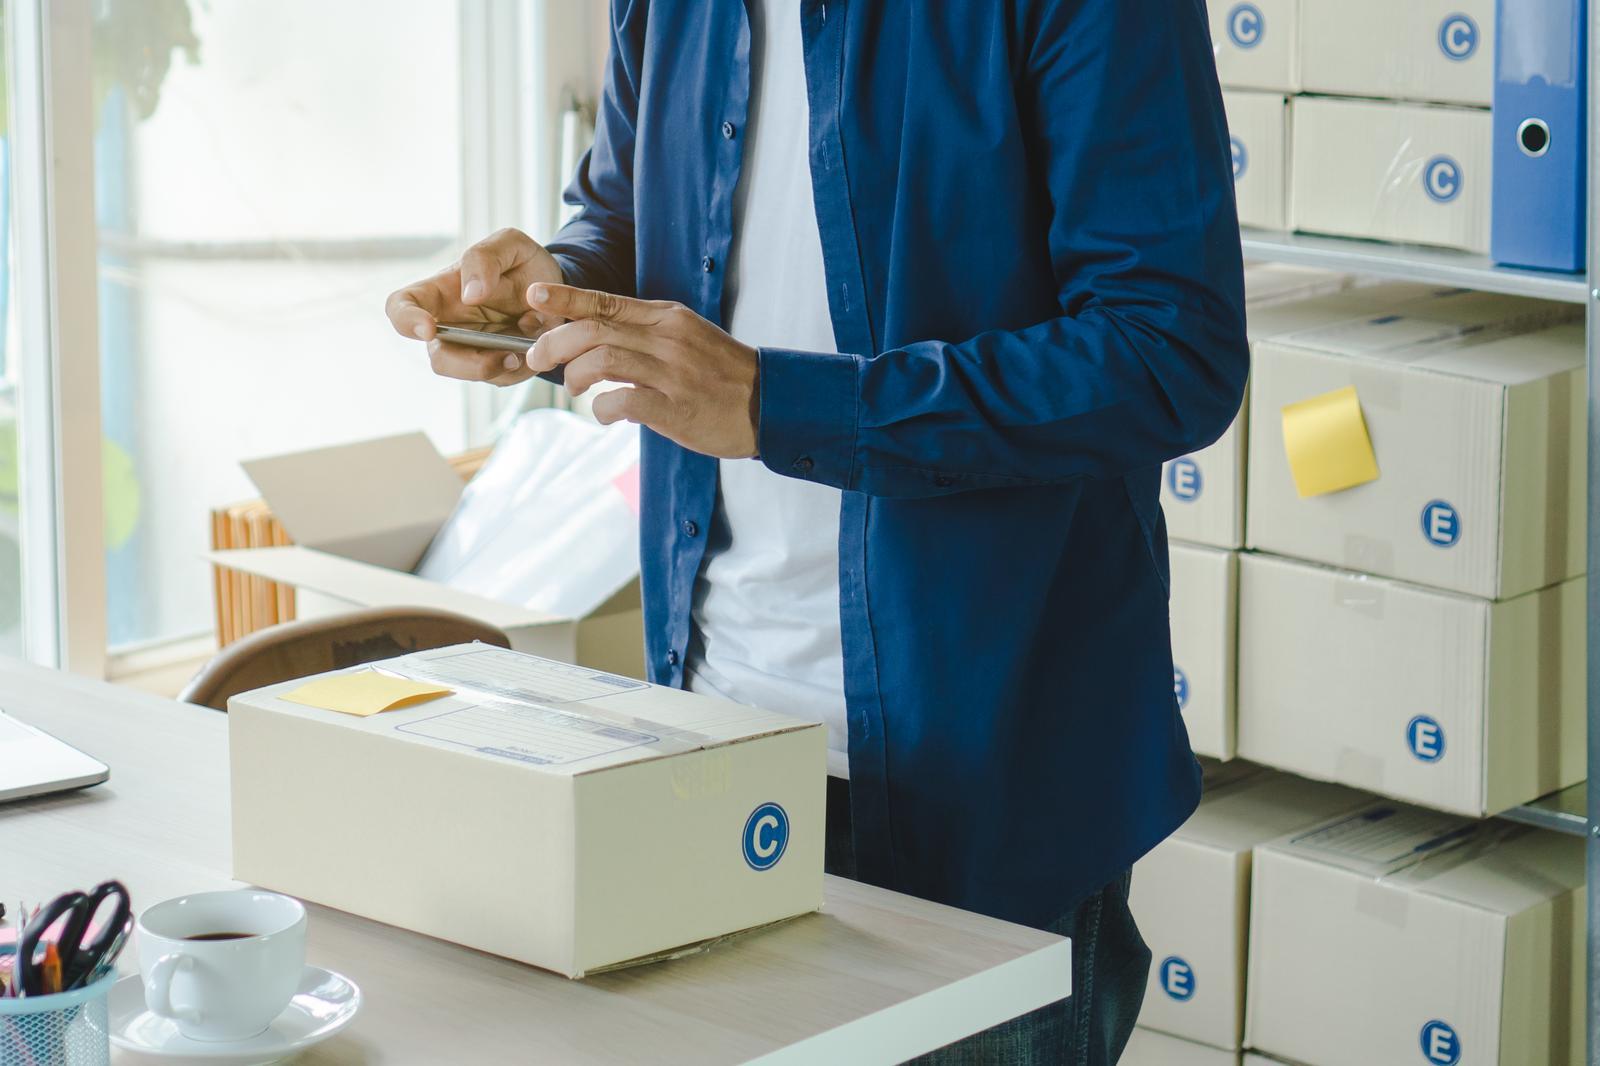 Retail sale via mail order houses or via Internet in Pärnu county